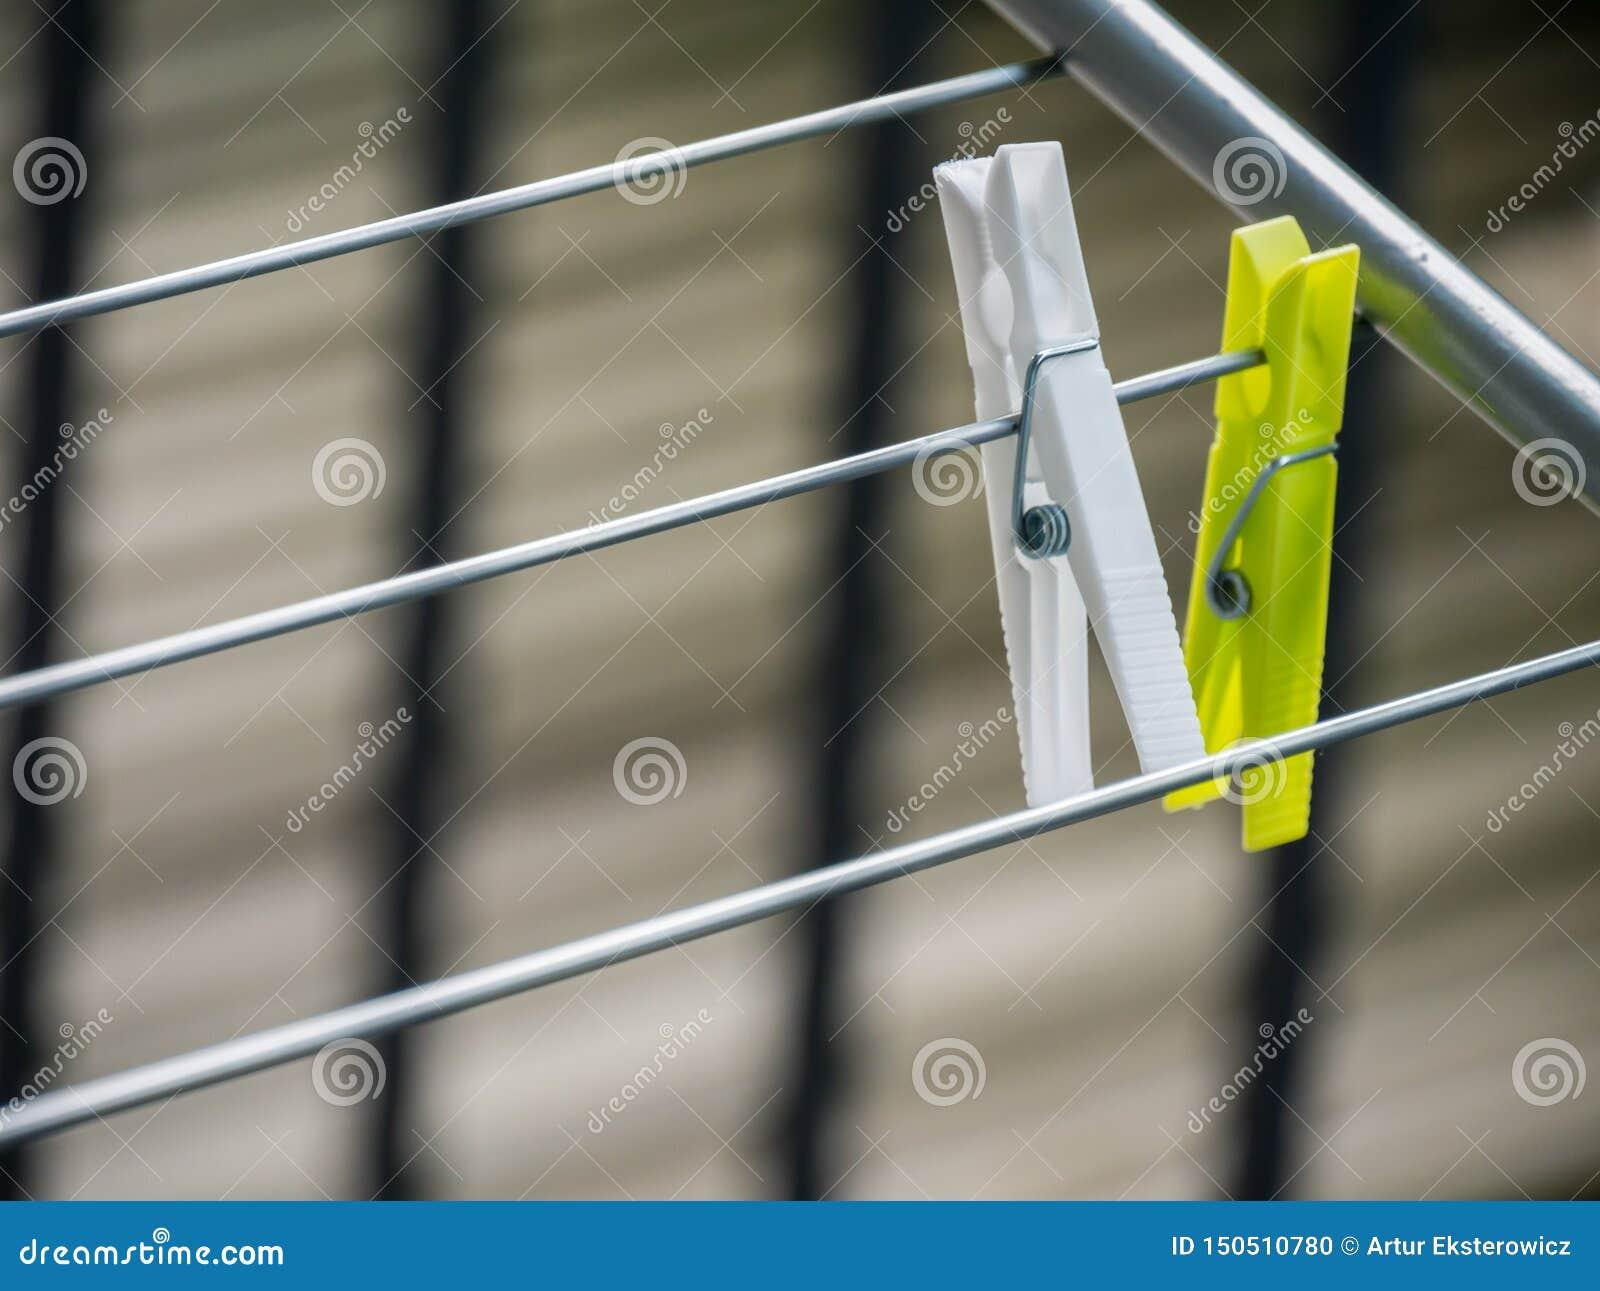 A lavanderia plástica colorida pendura com fundo borrado